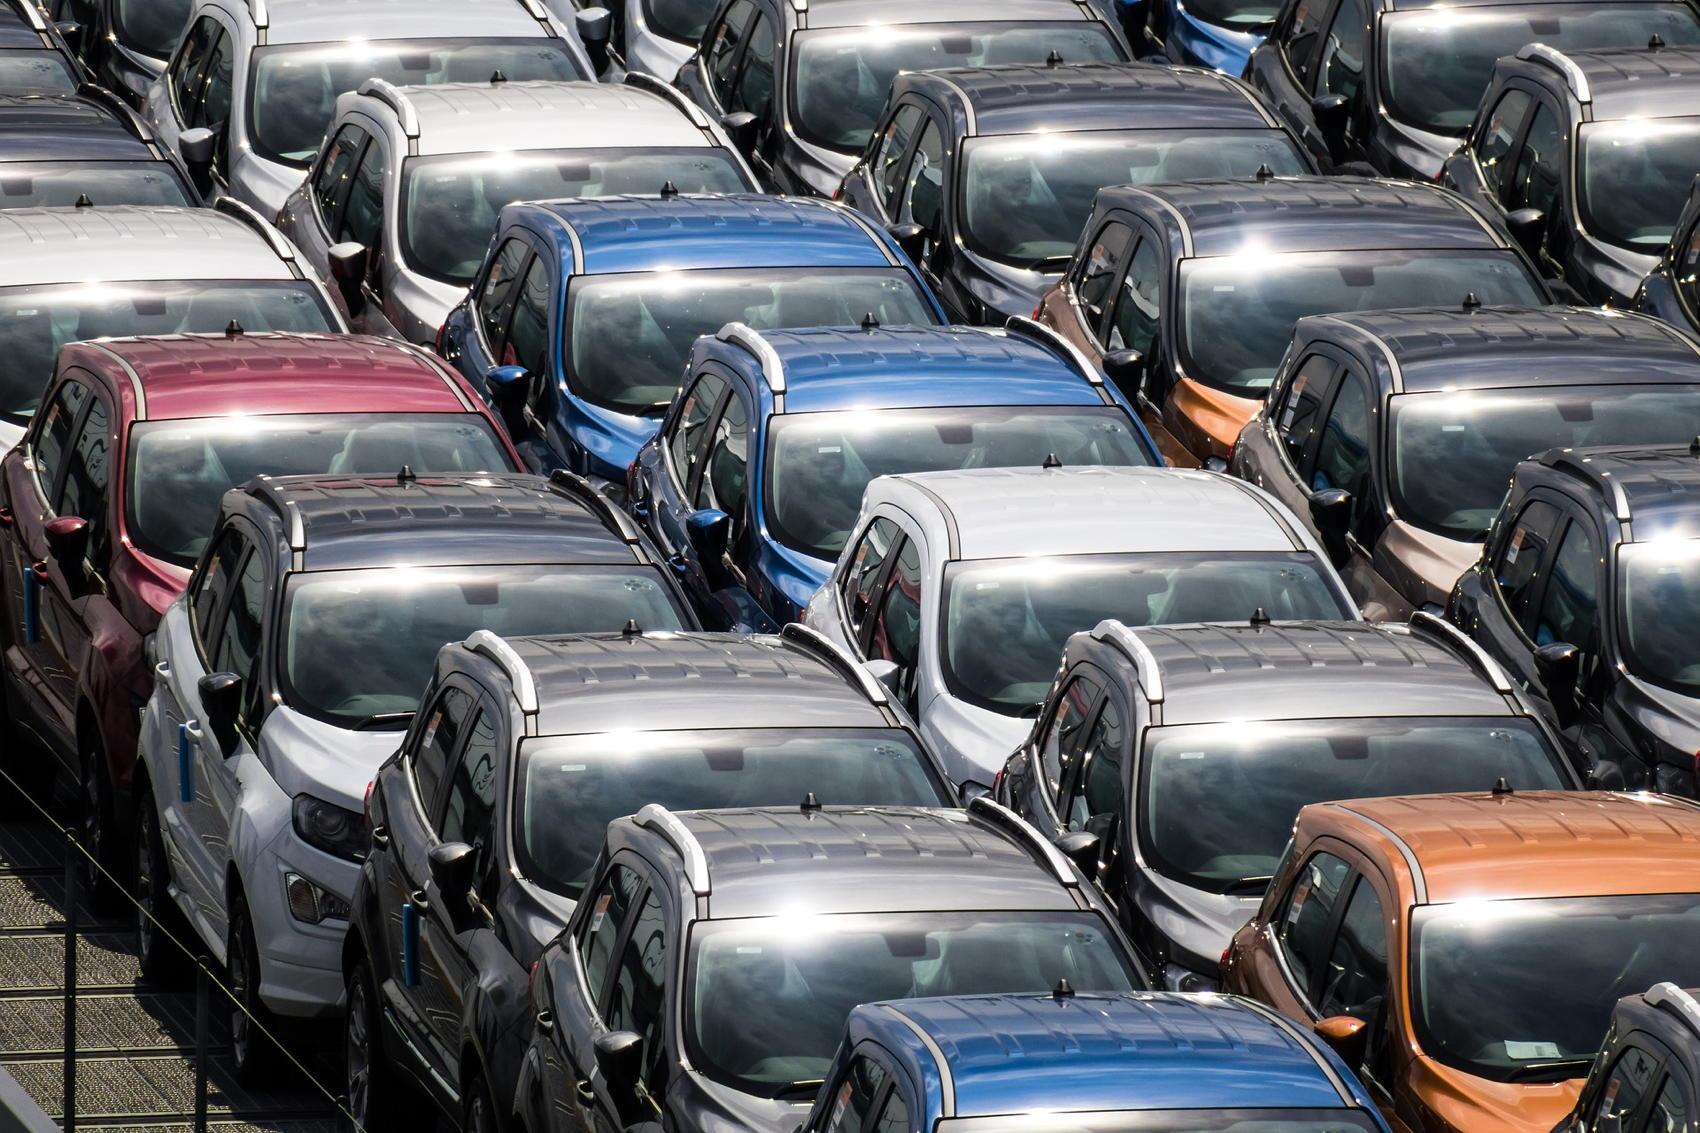 New Cars - Image by Thomas B